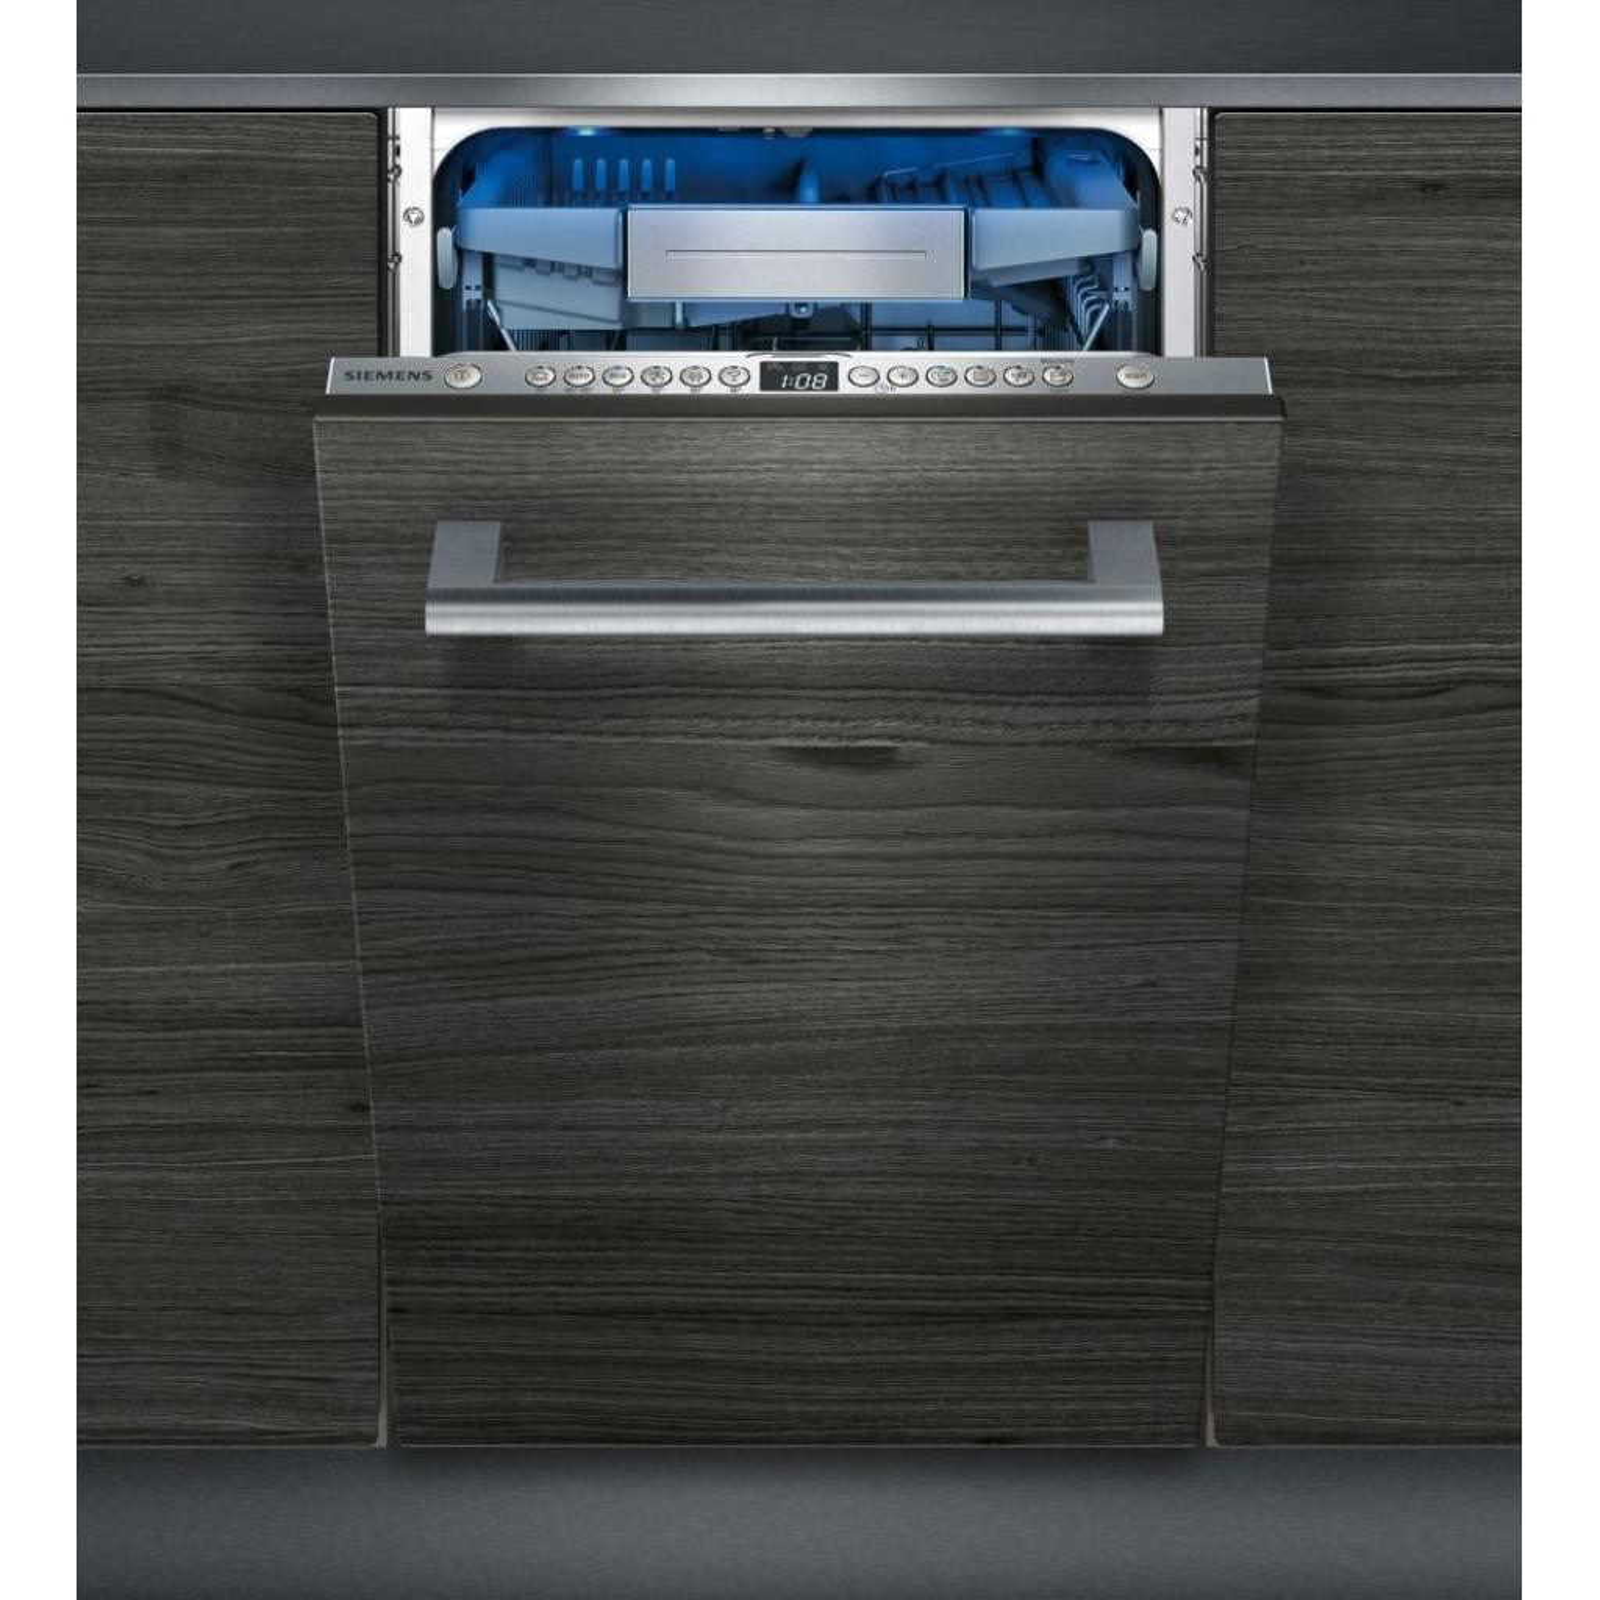 Посудомоечная машина Siemens SR 656 X01TE